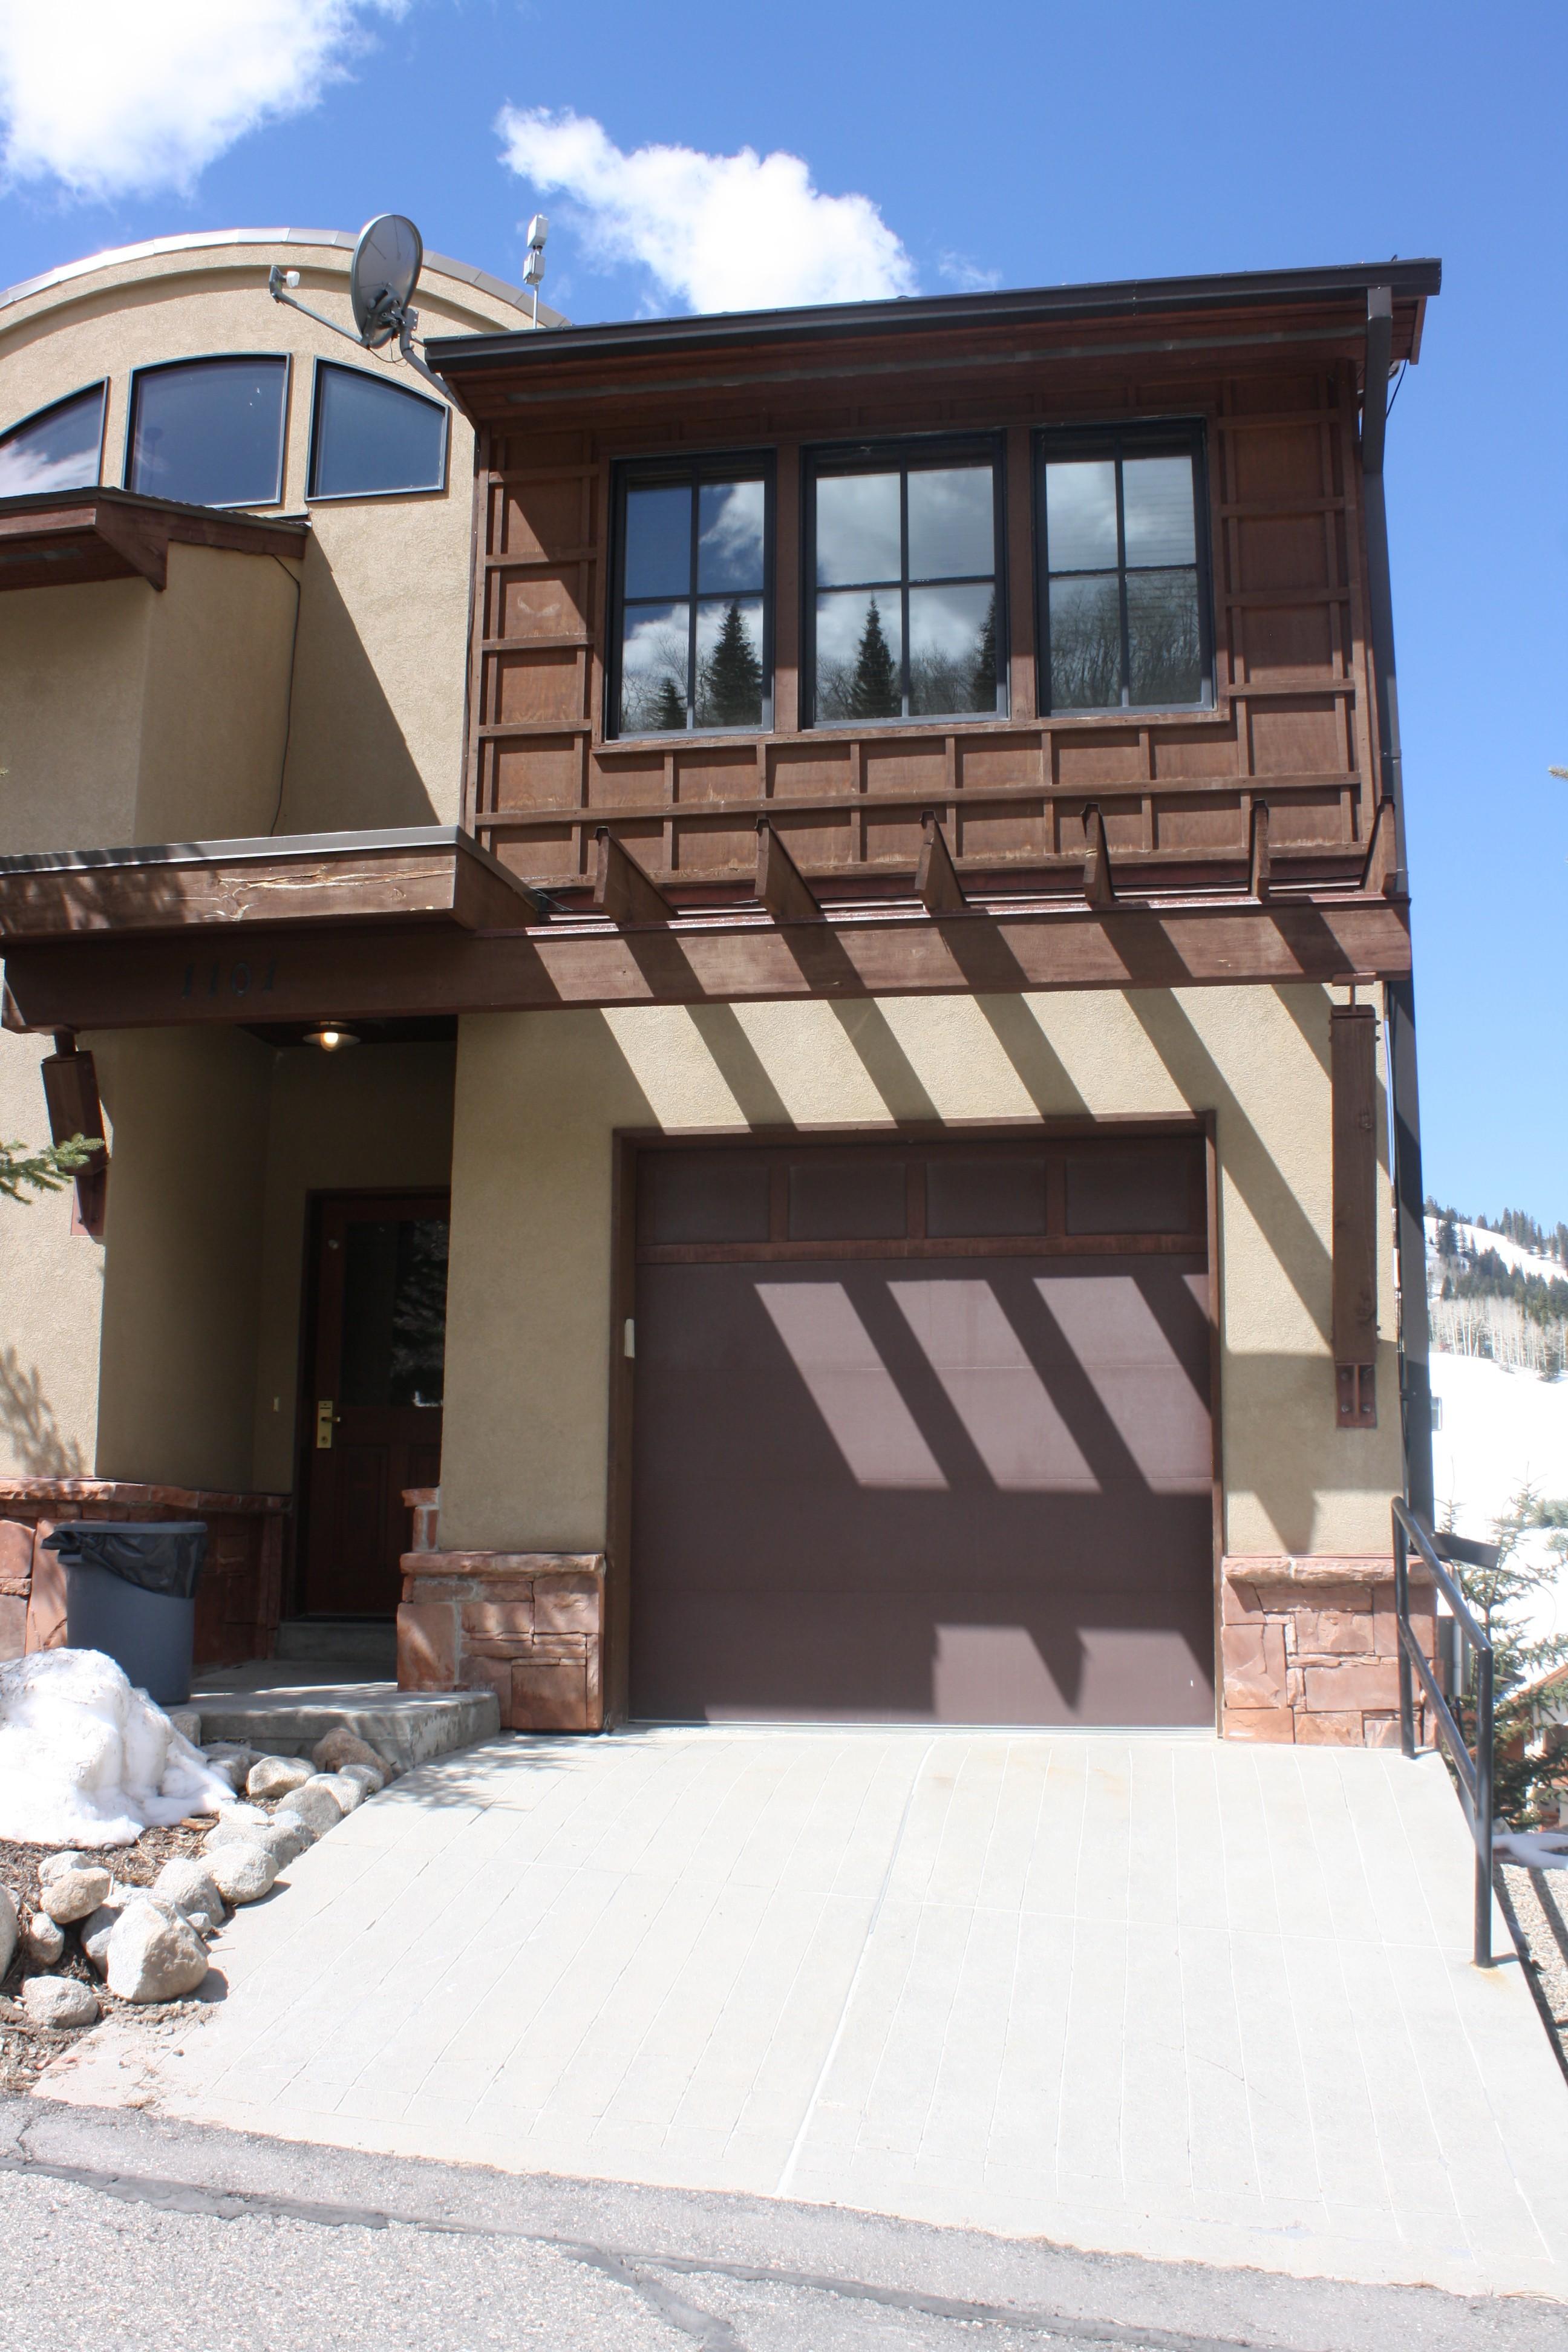 12150 Big Cottonwood Canyon Road 1101 Salt Lake City Ut 84121 3 Bedroom Apartment For Rent